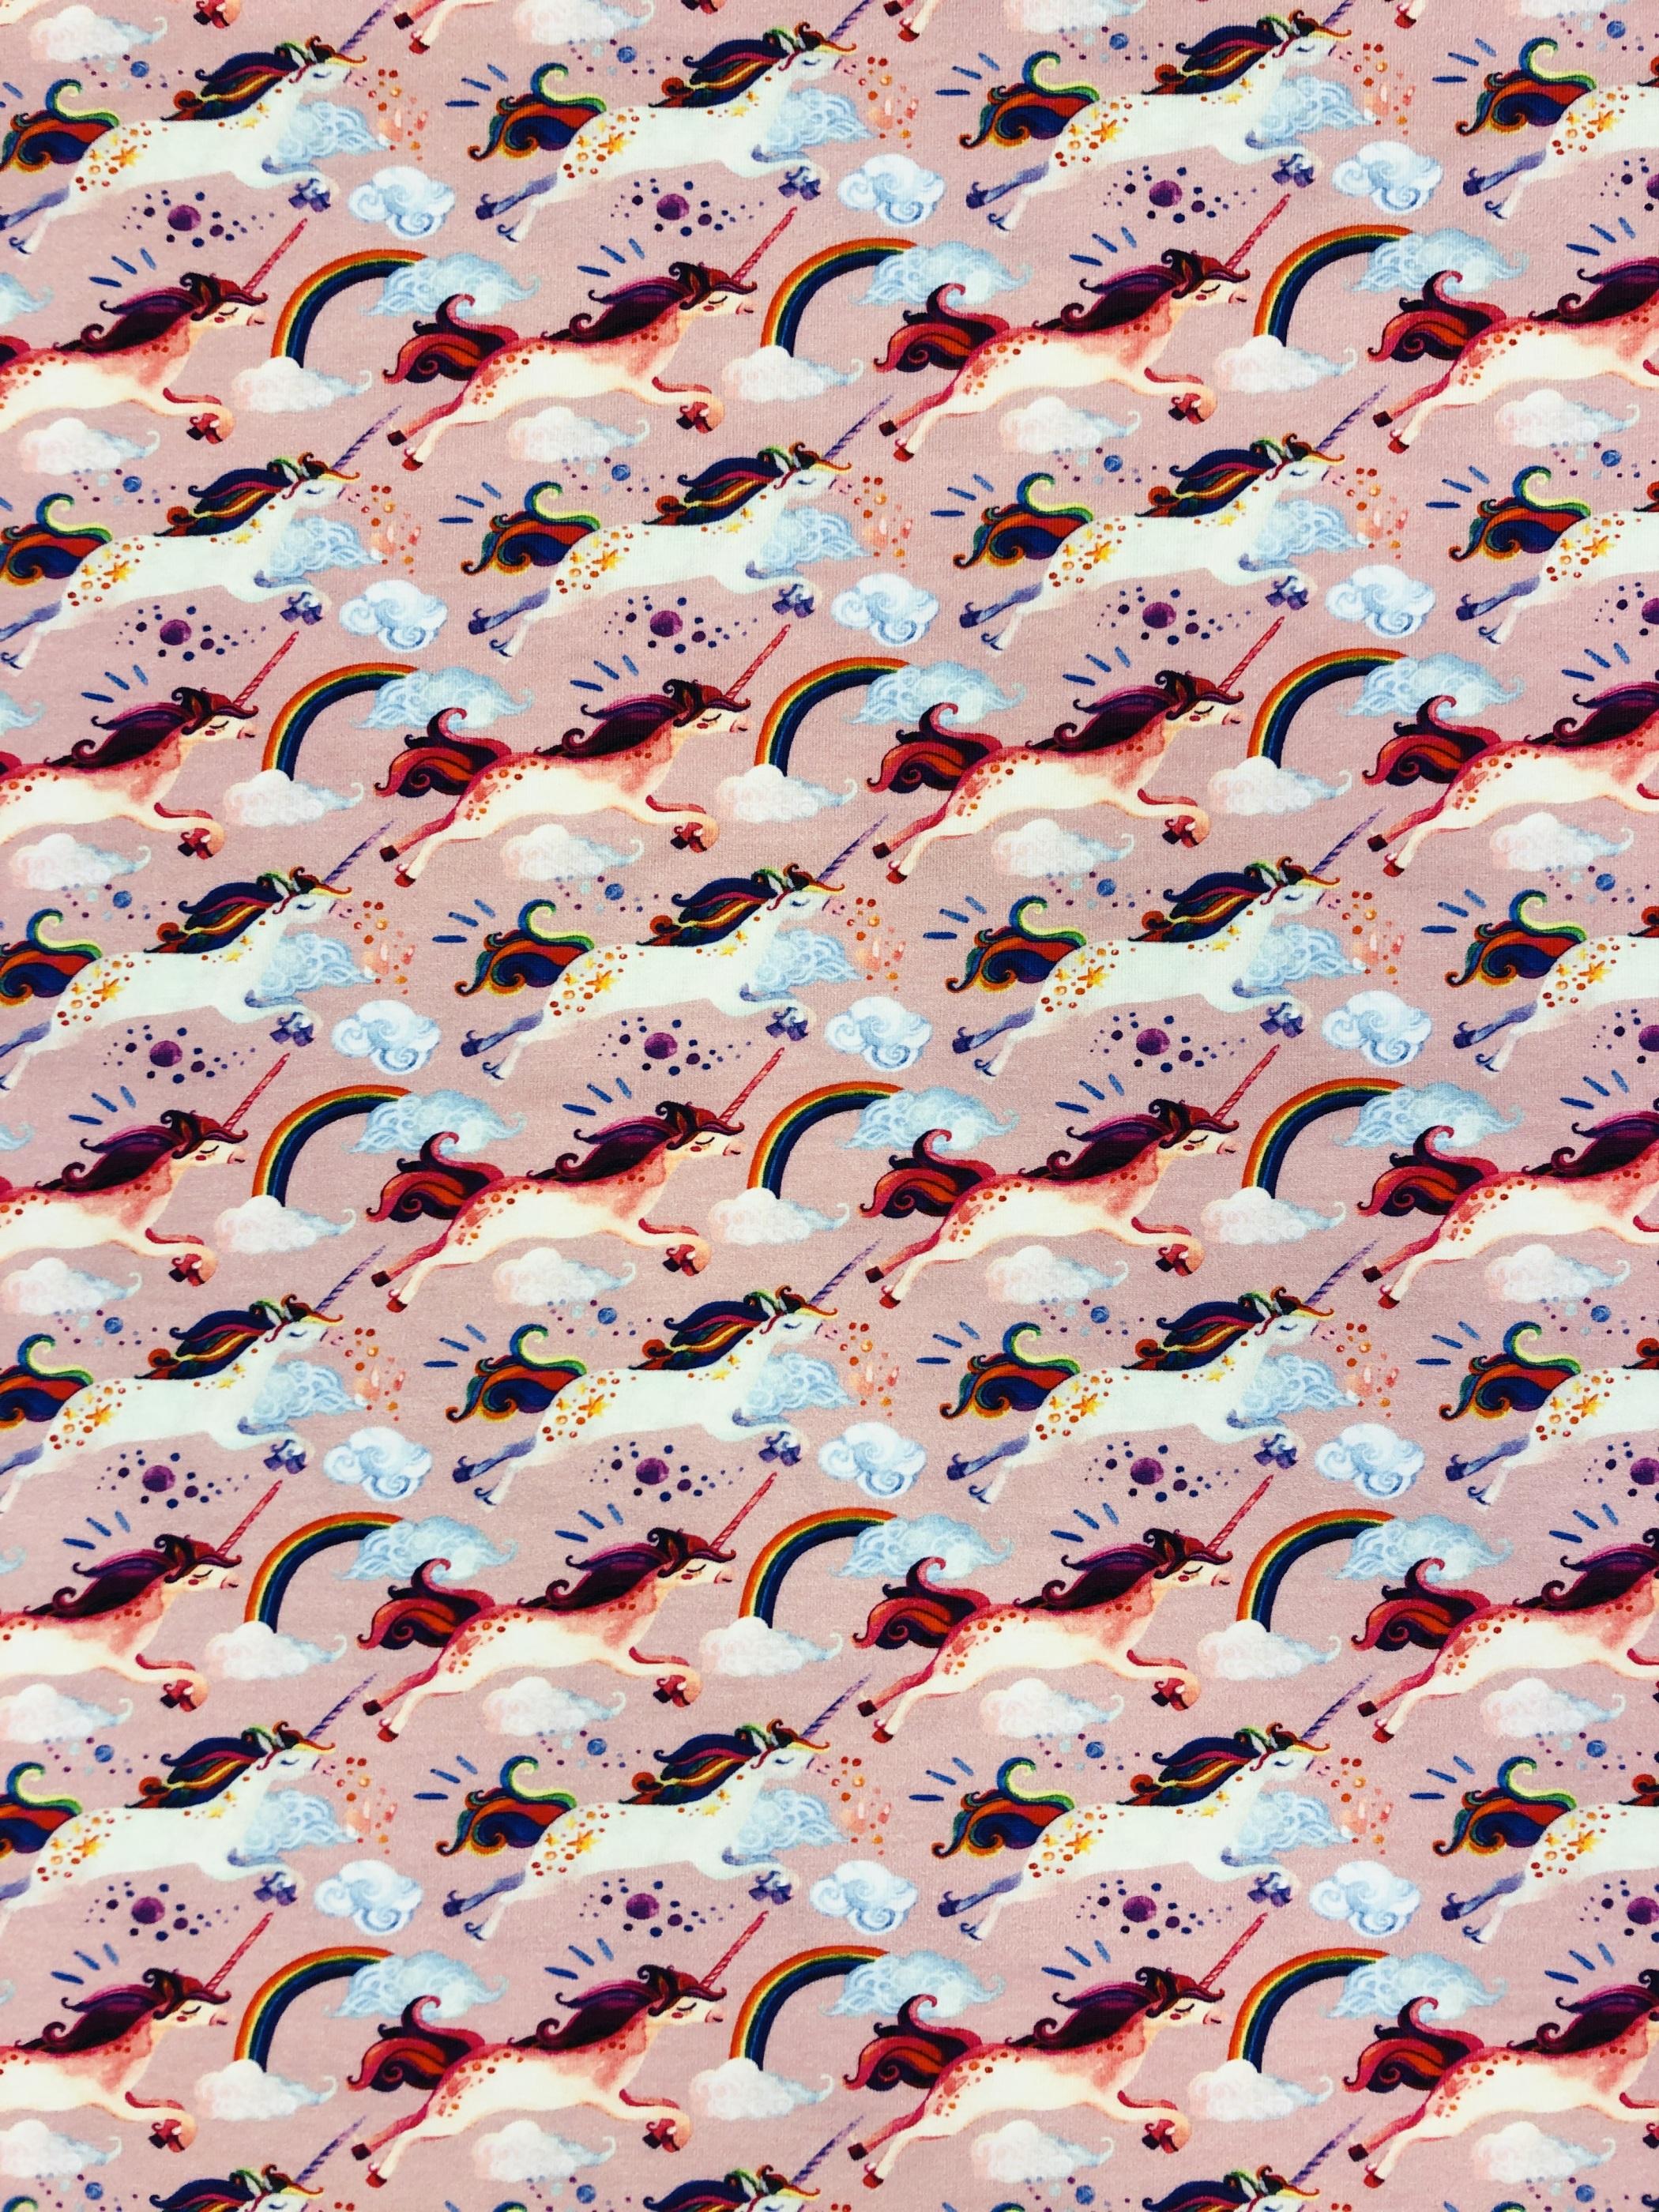 Rosa pastell enhörning unicorn regnbåge Modetyg trikå metervara bomull Tyglust laholm